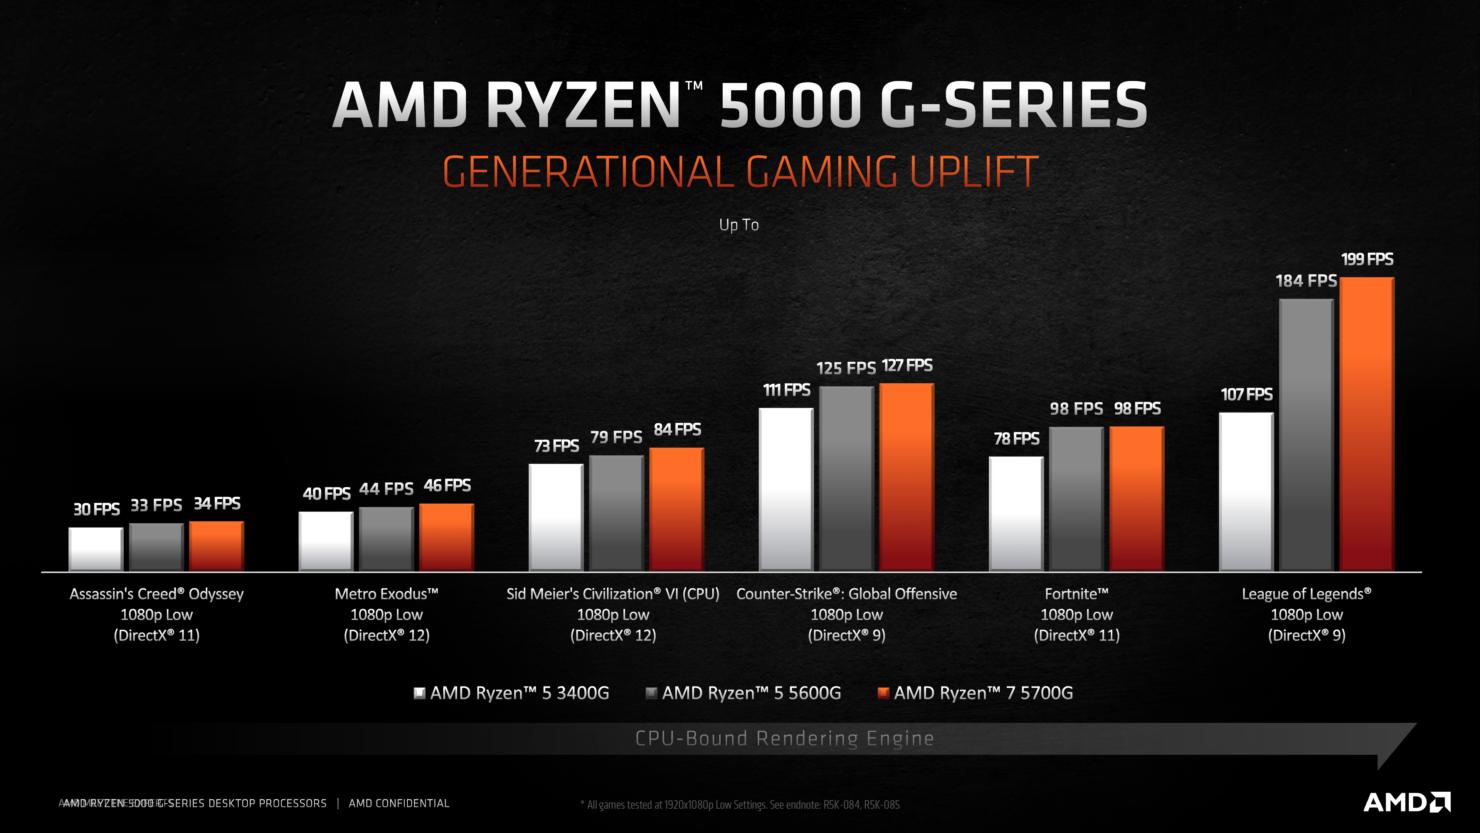 amd-ryzen-5000g-desktop-apus-launch-_-ryzen-7-5700g-ryzen-5-5600g-_5